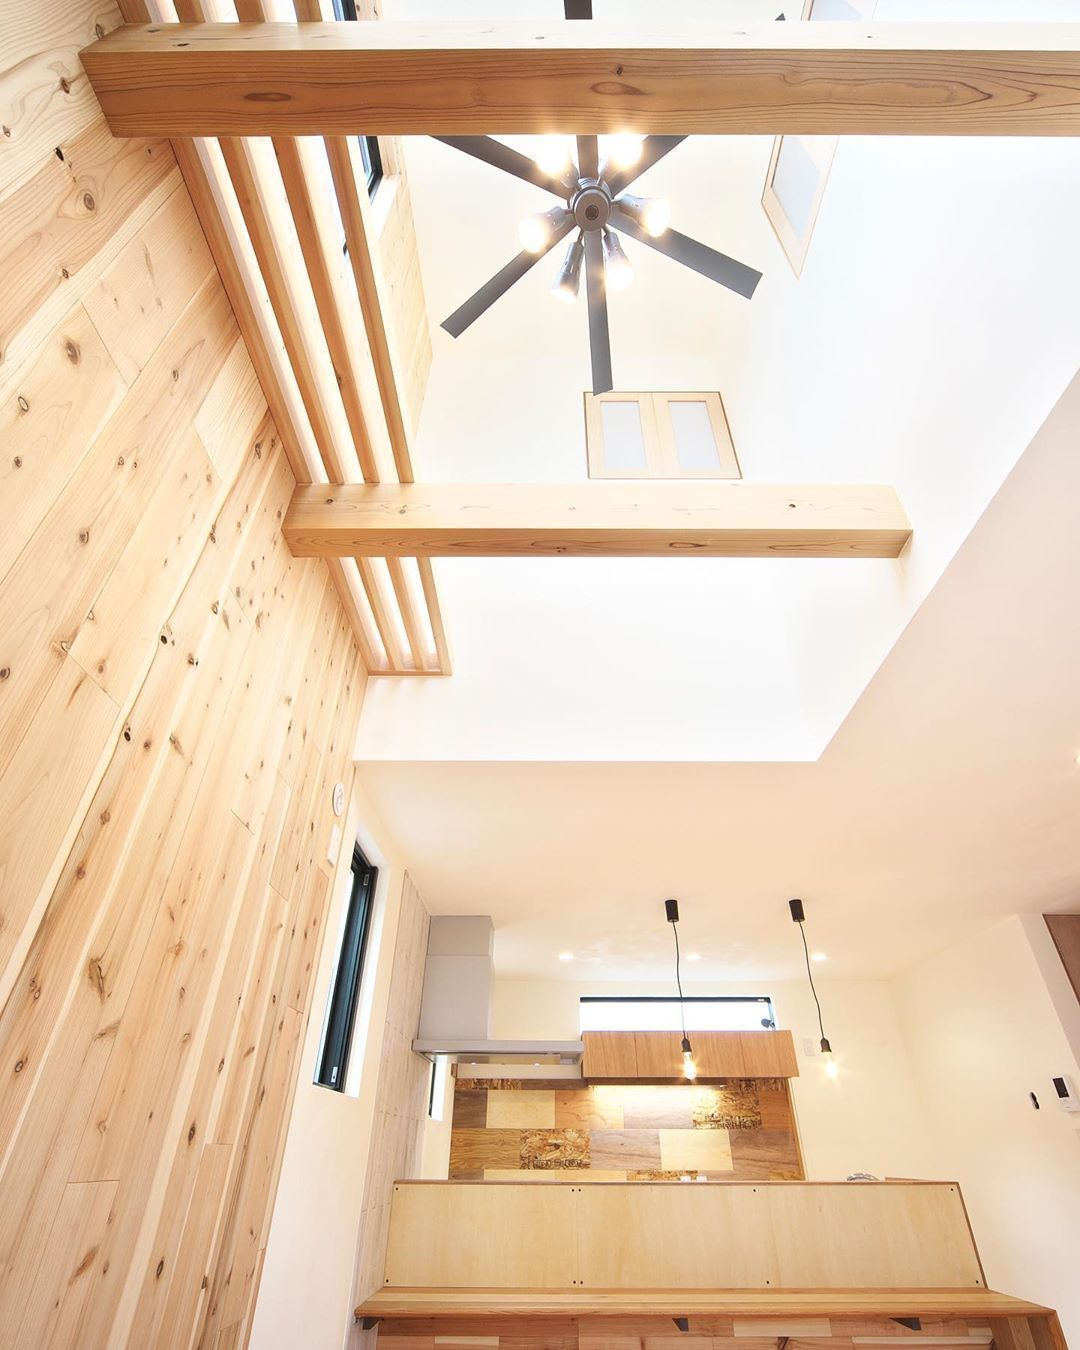 Minimaru Design On Instagram サッシメンテナンス用にキャット Design House Design Home